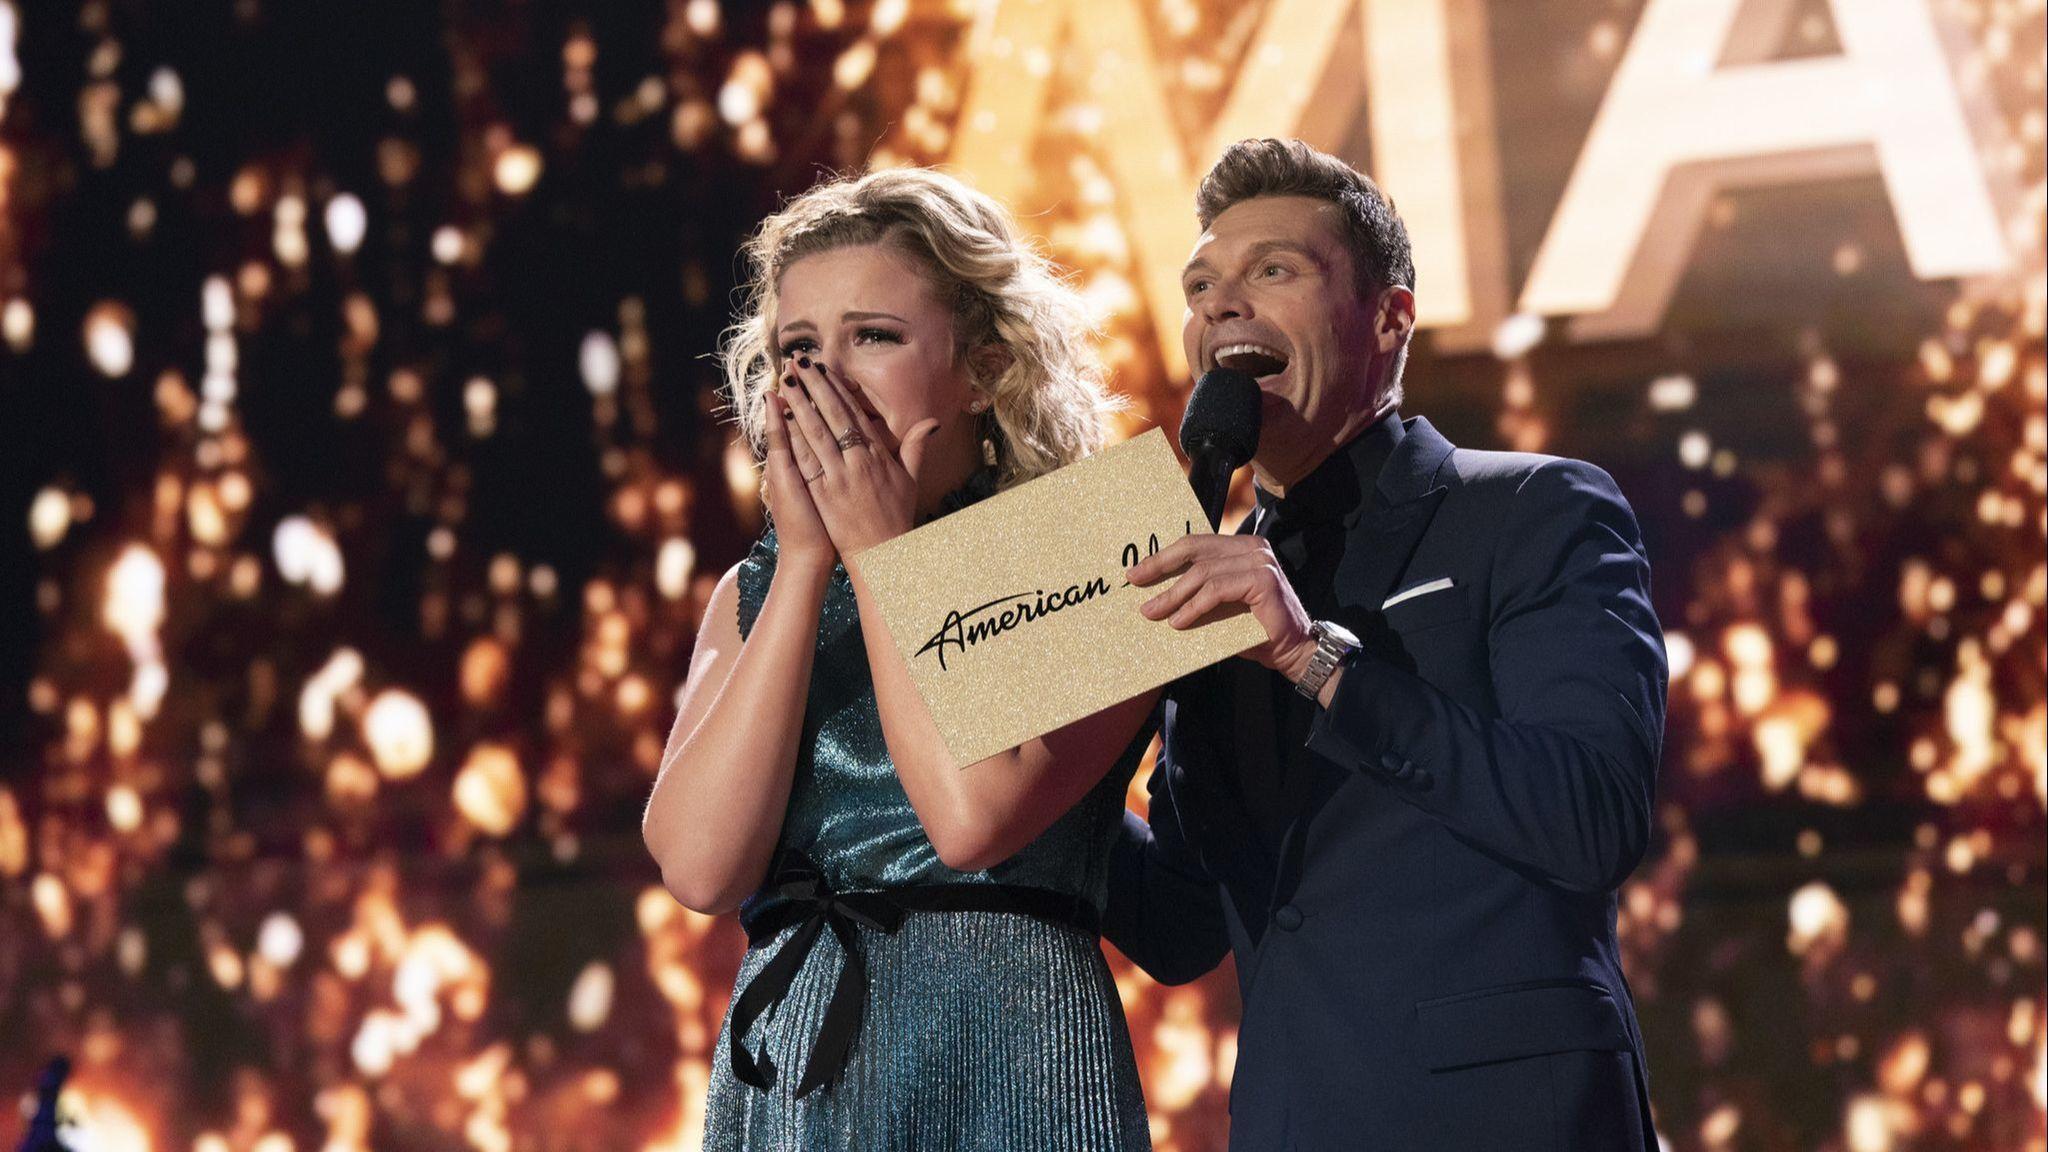 For 'American Idol' winner Maddie Poppe, a wild ride to national stardom